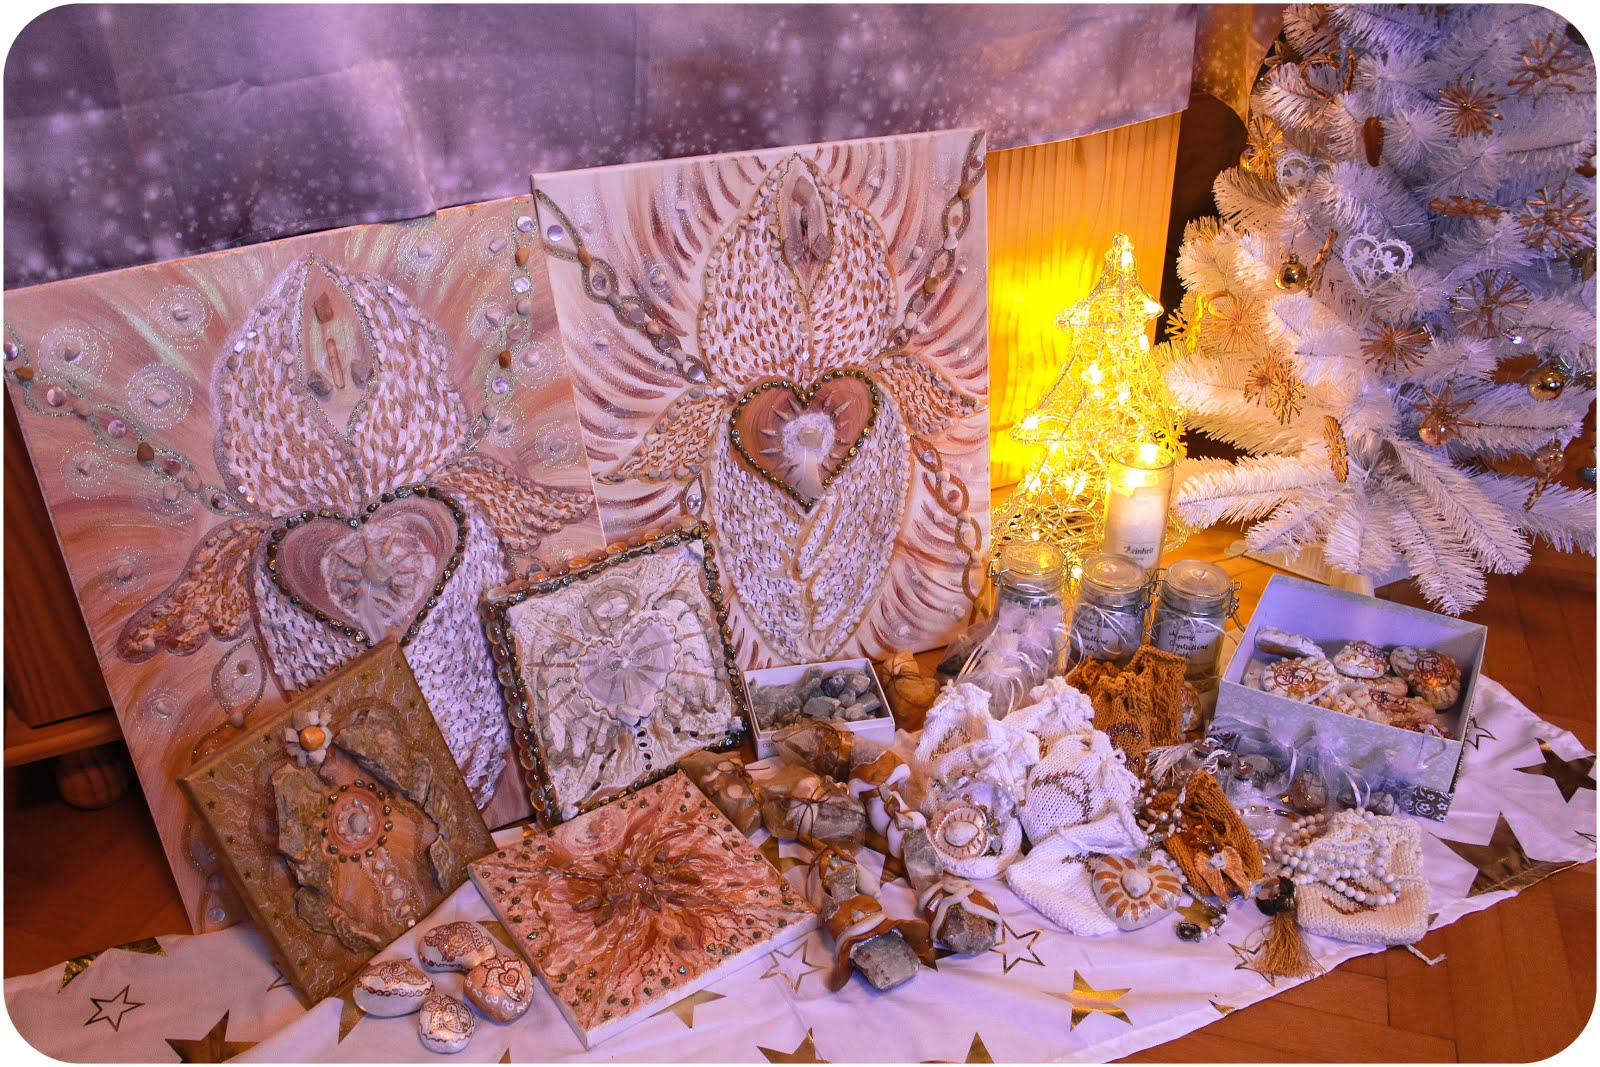 Seraphim Art